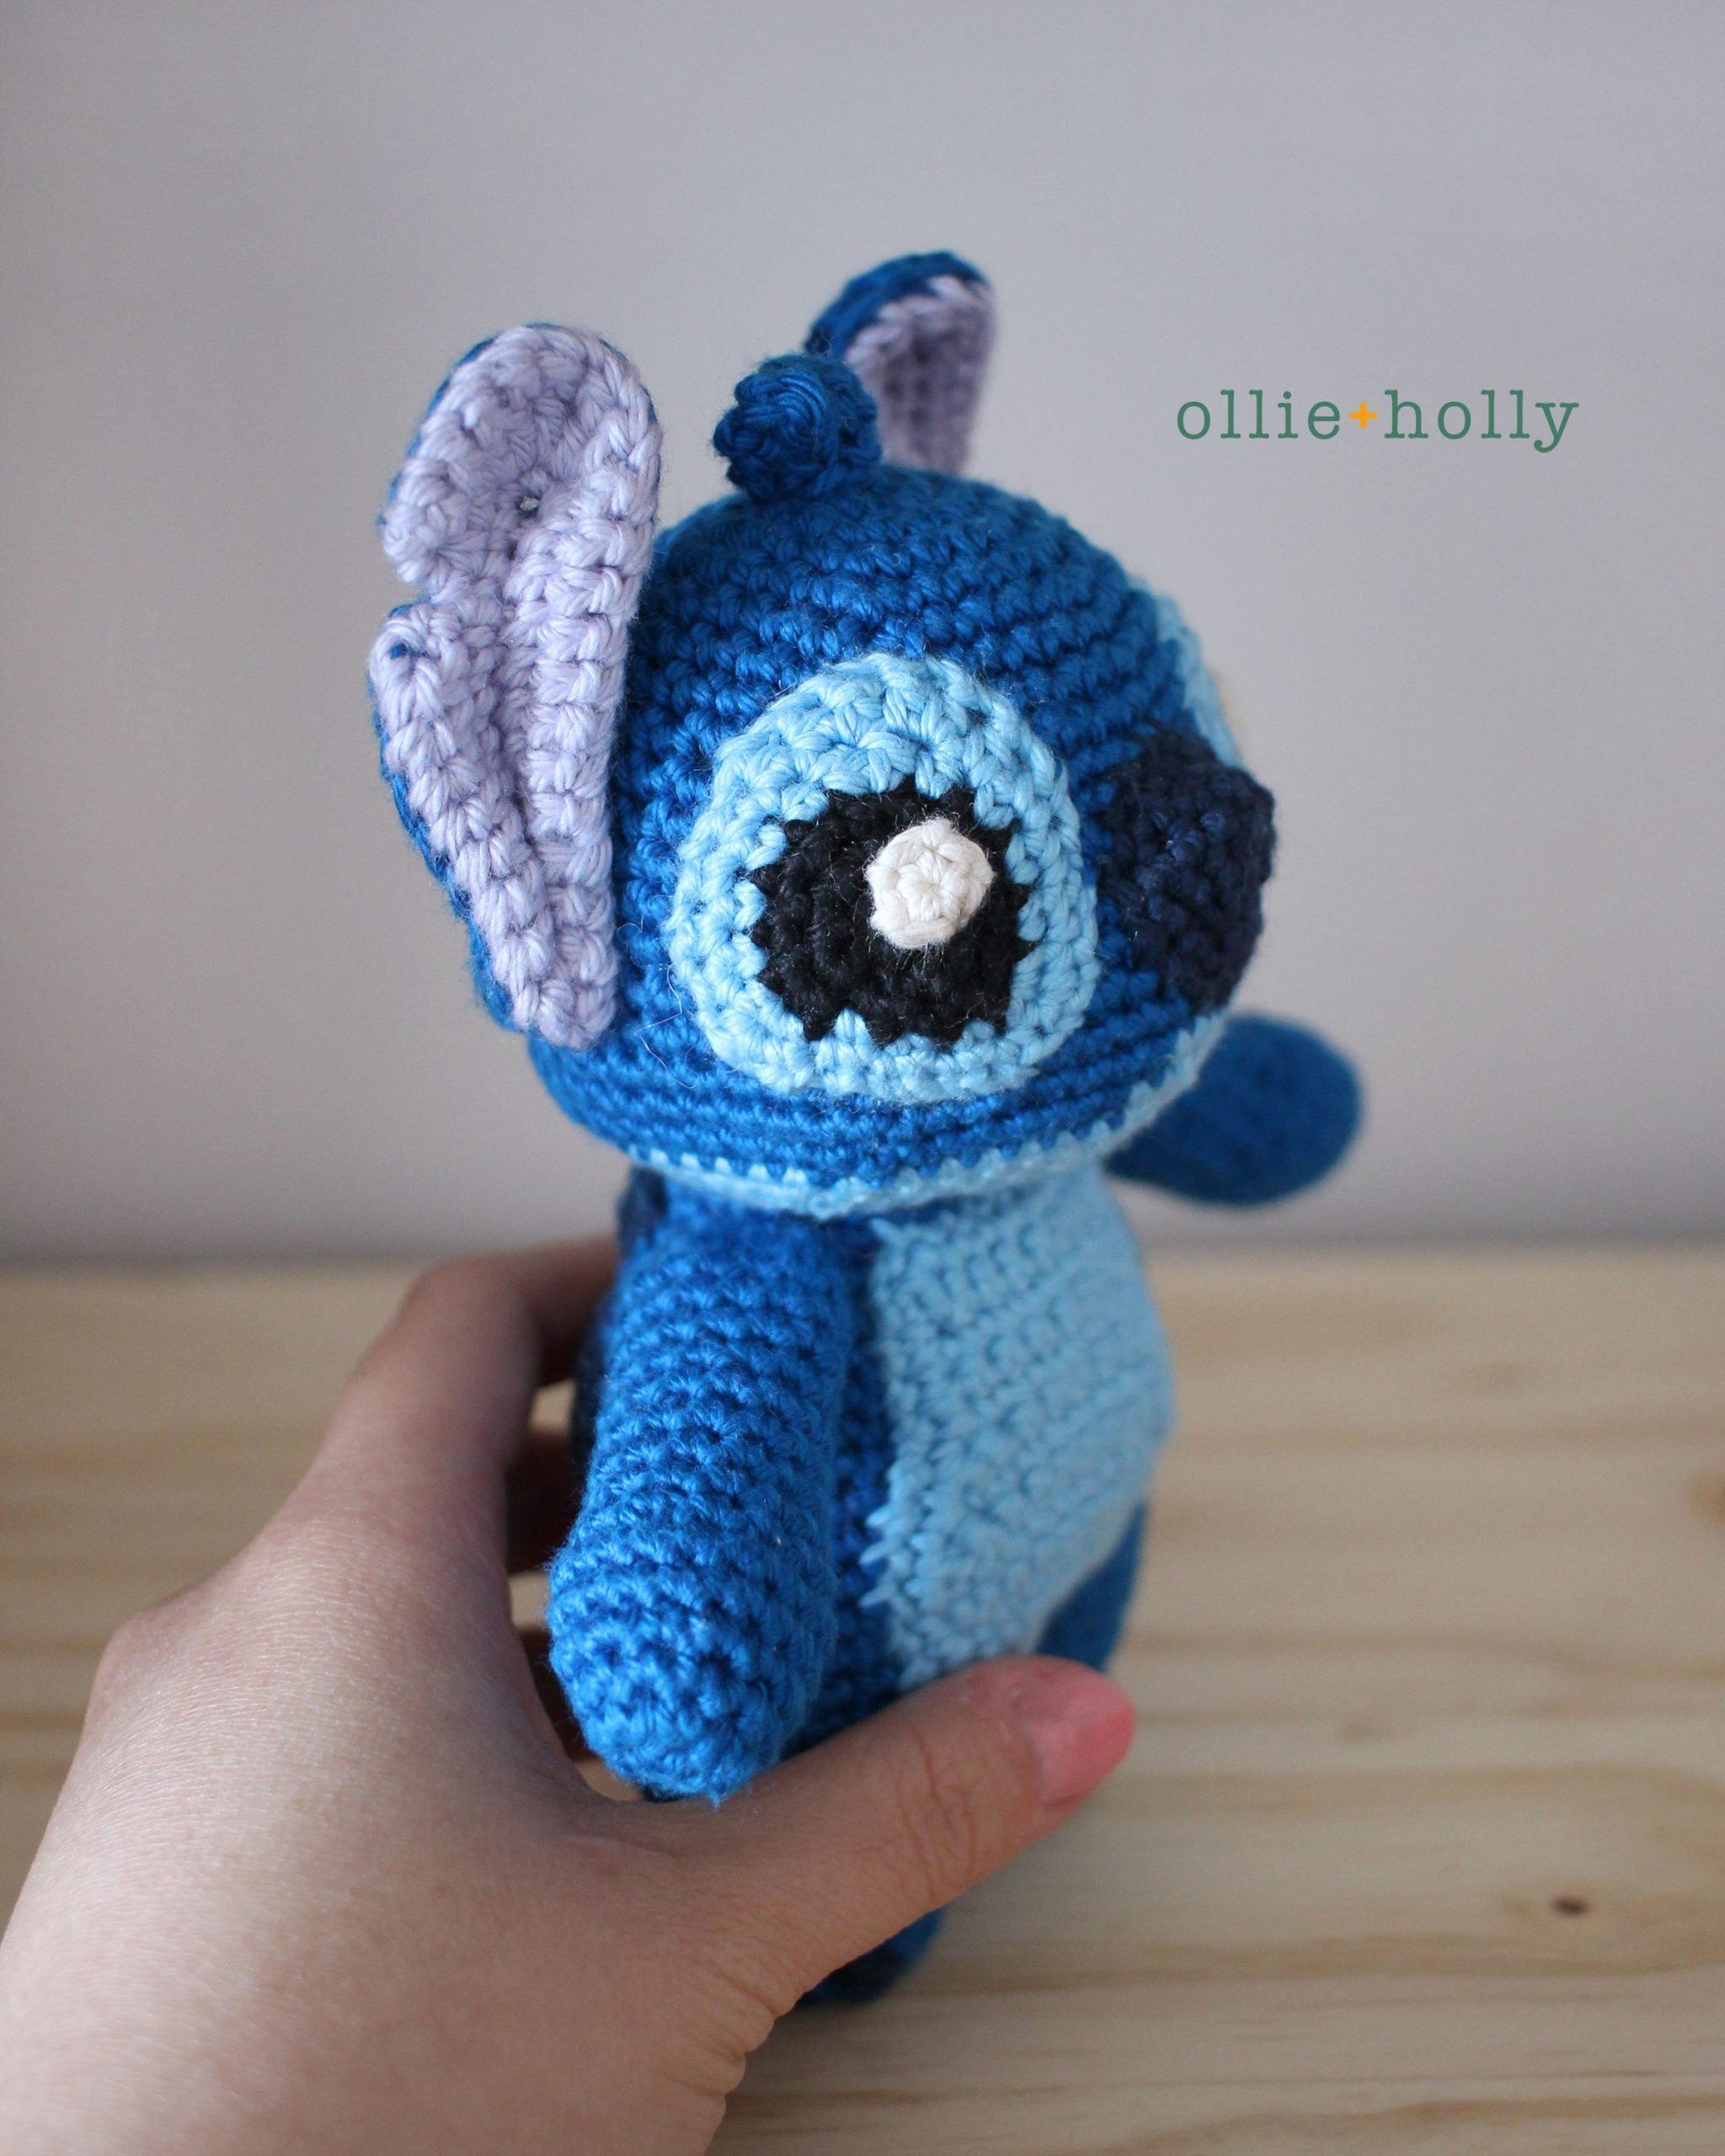 Stitch & Co